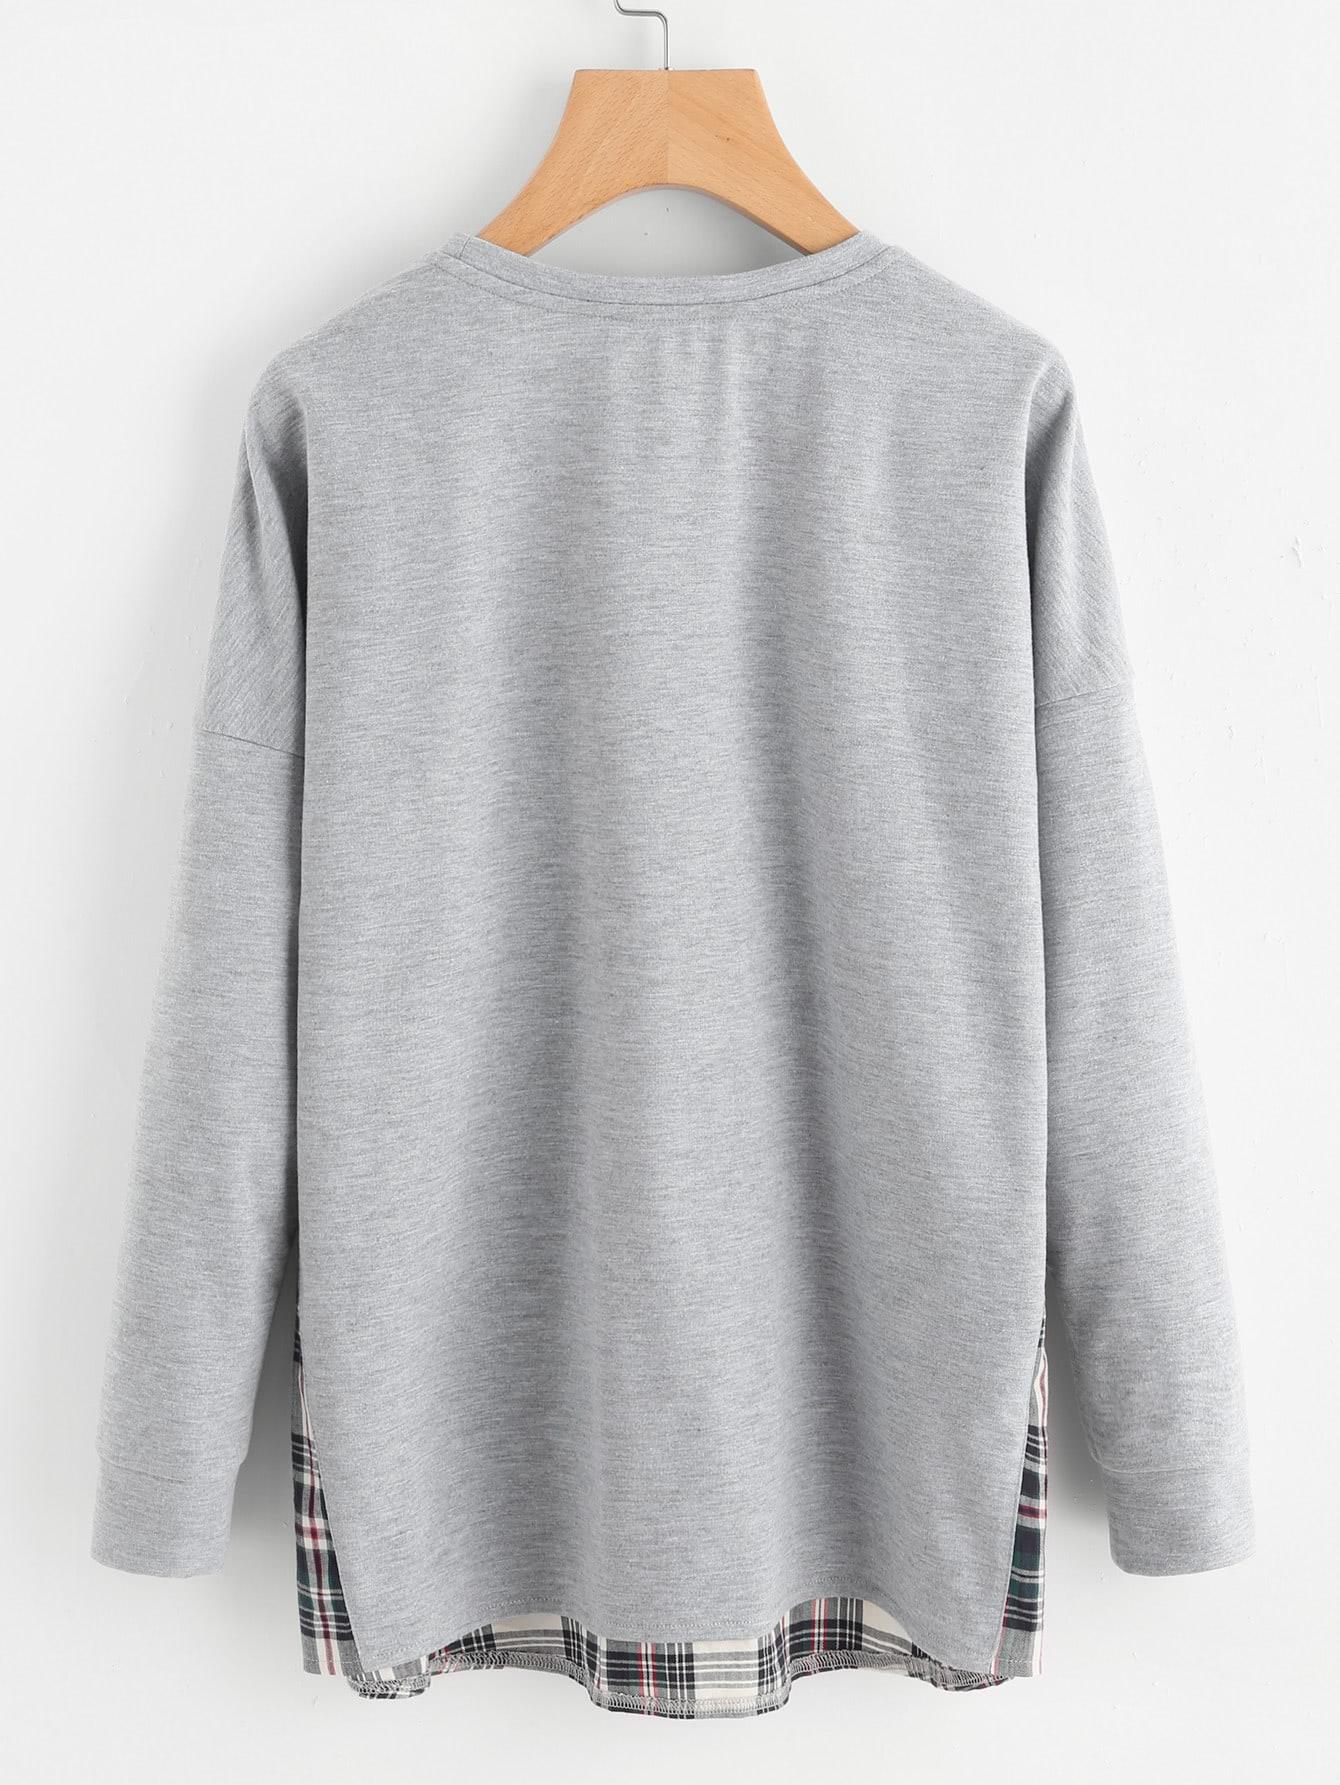 Drop Shoulder Checkered Hem Heathered Sweatshirt